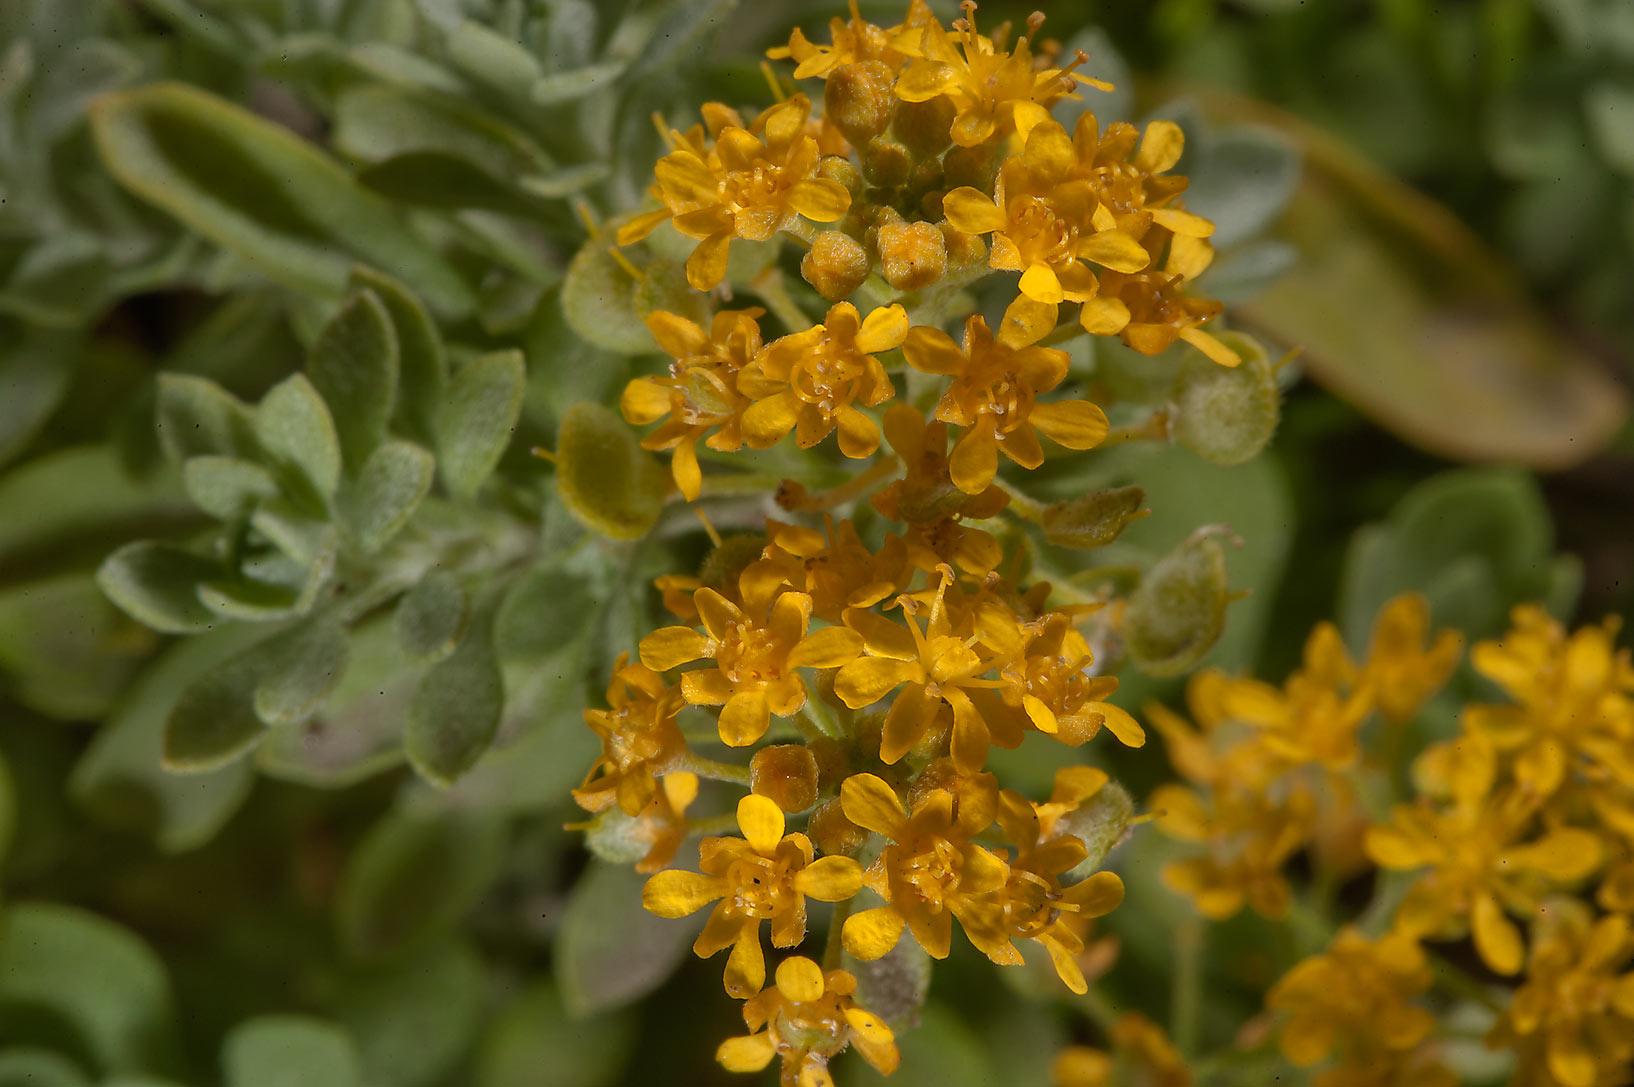 Photo 1622 18 yellow flowers of mustard family in botanic x large image mightylinksfo